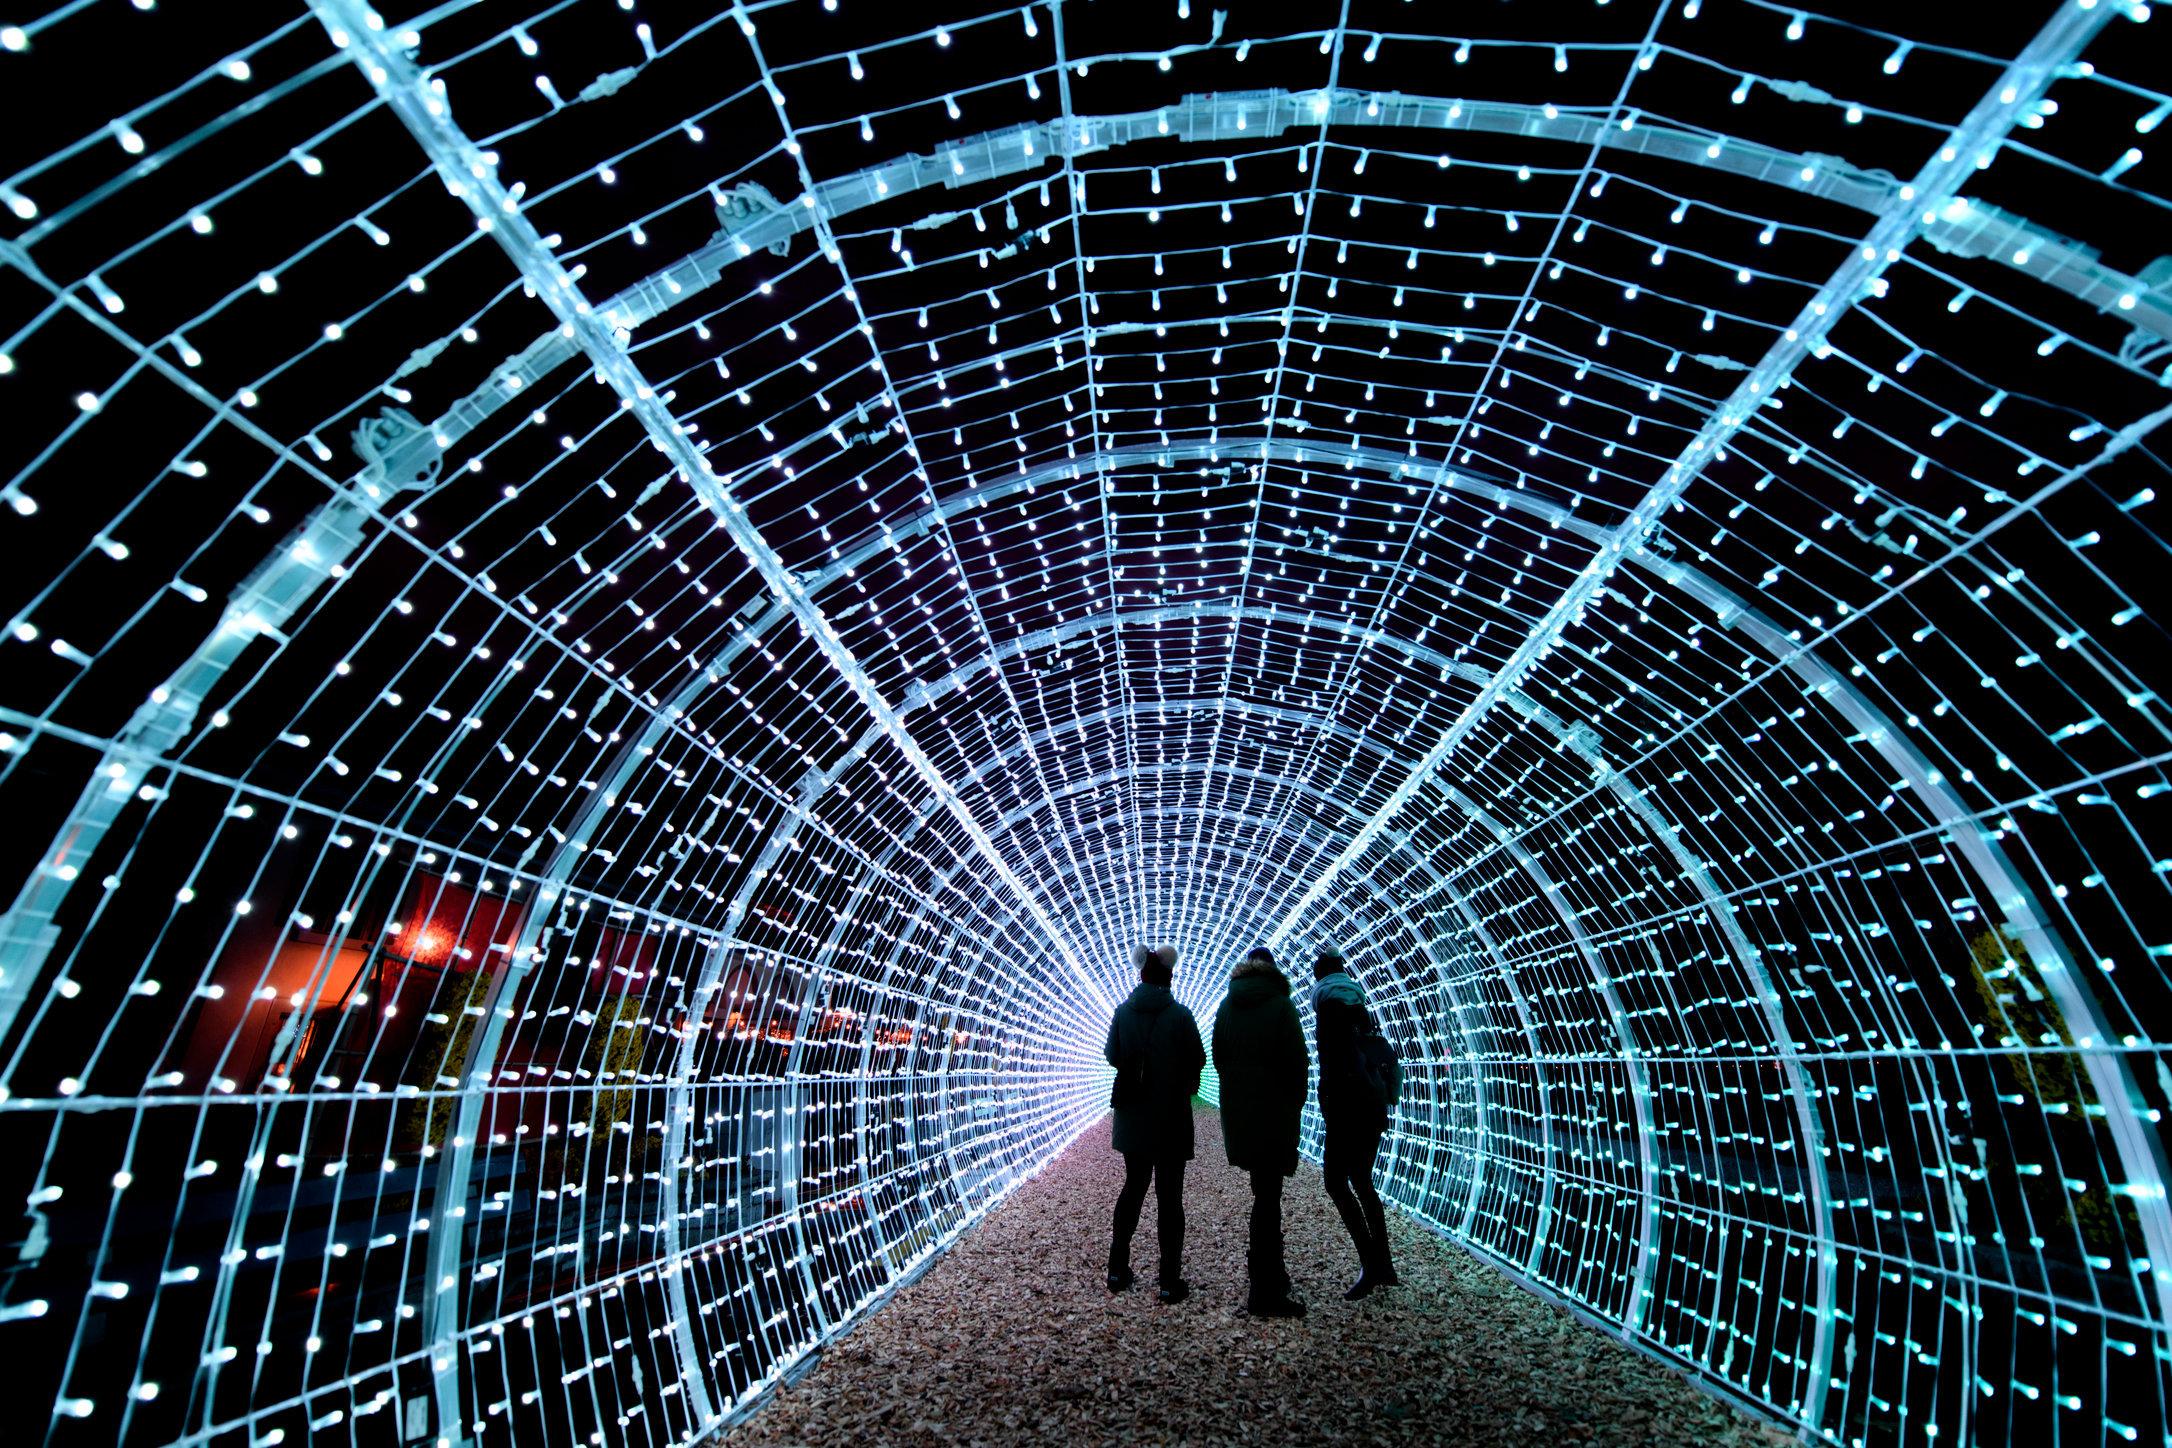 Light tunnel - Vevey - 2017